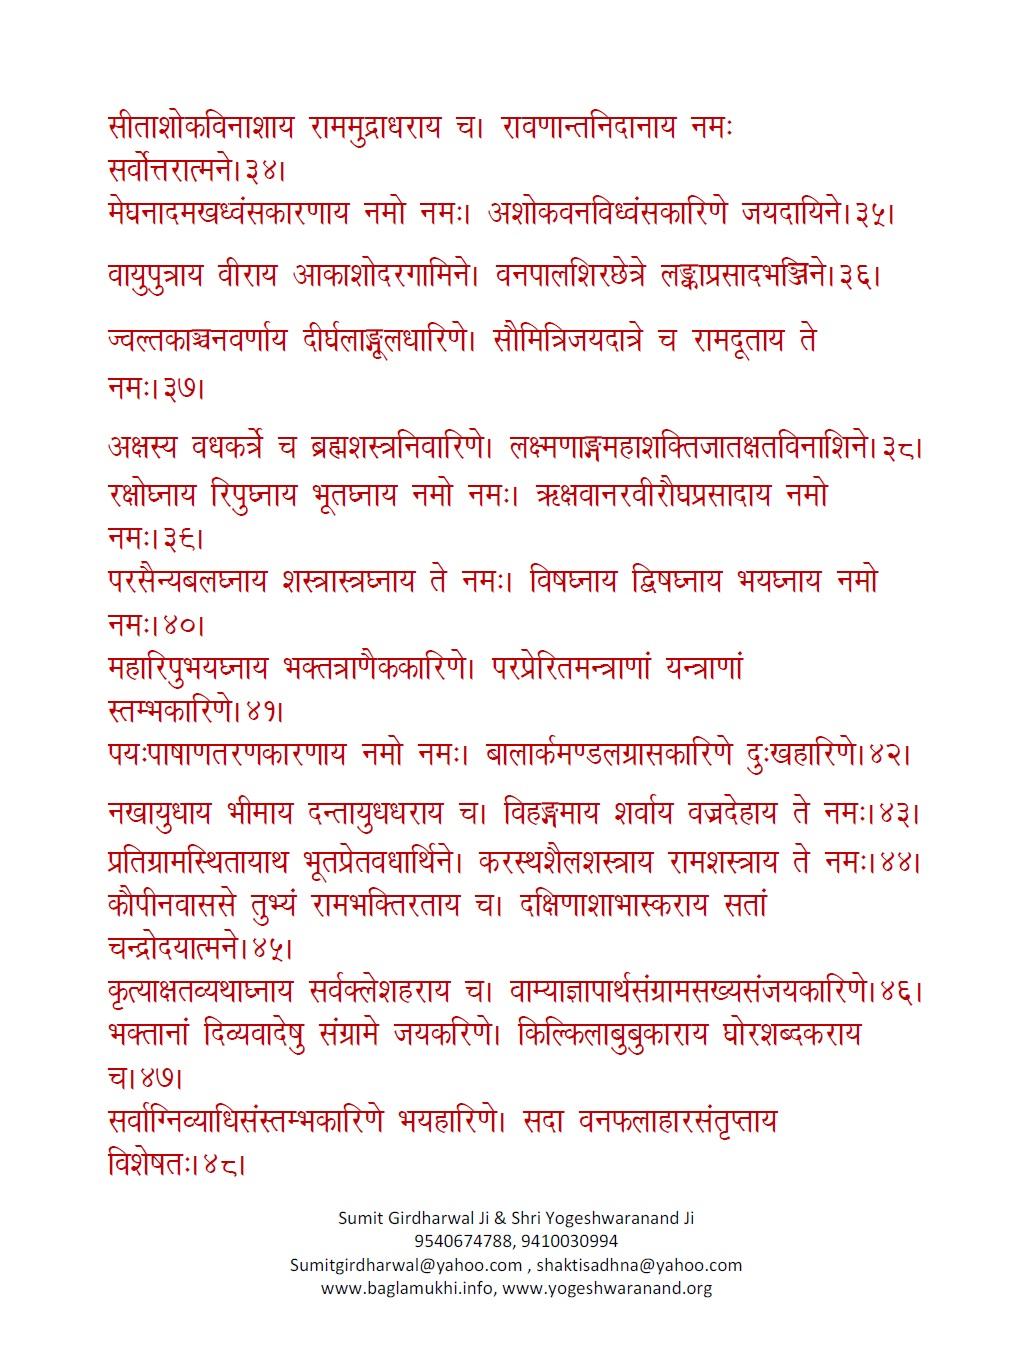 Hanuman Mantra Sadhana Evam Siddhi Archives - Secret of